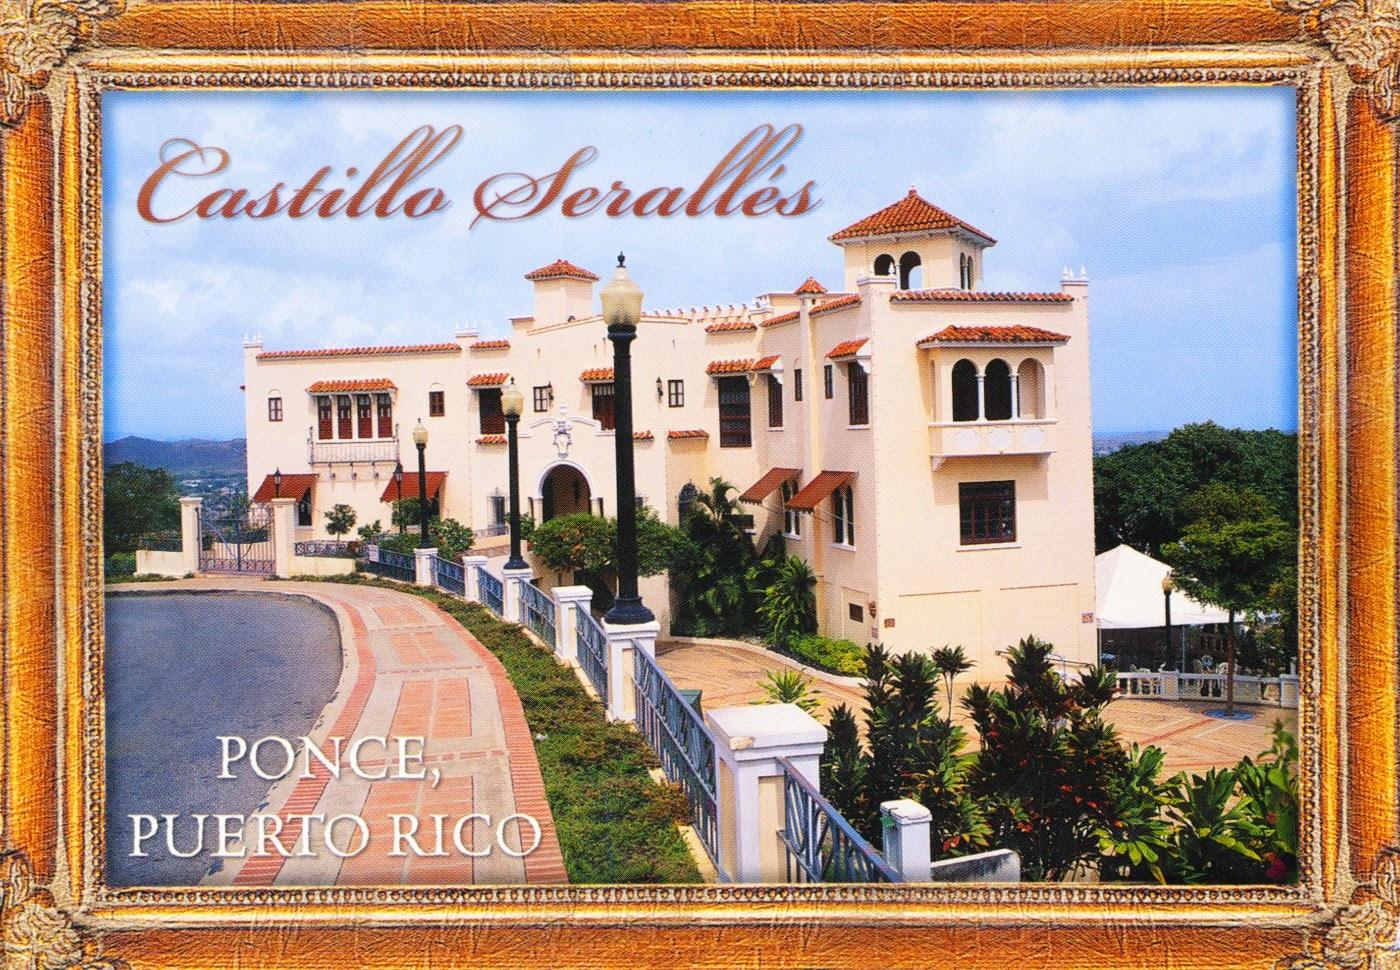 postcard, puerto rico, castillo serrallés